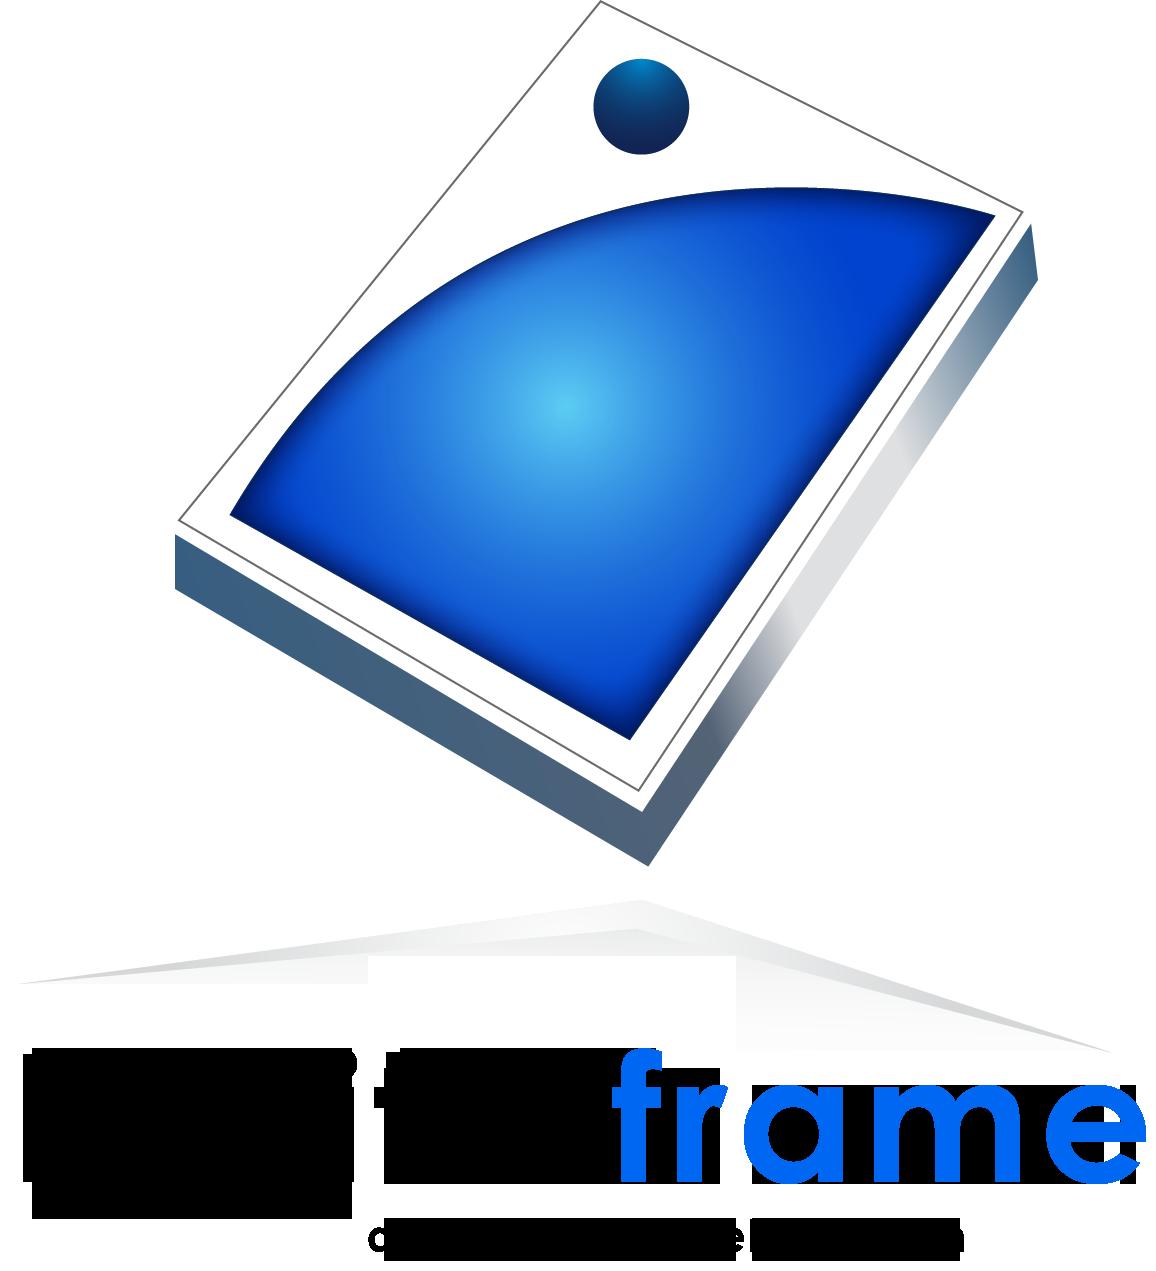 digitalframe.ws